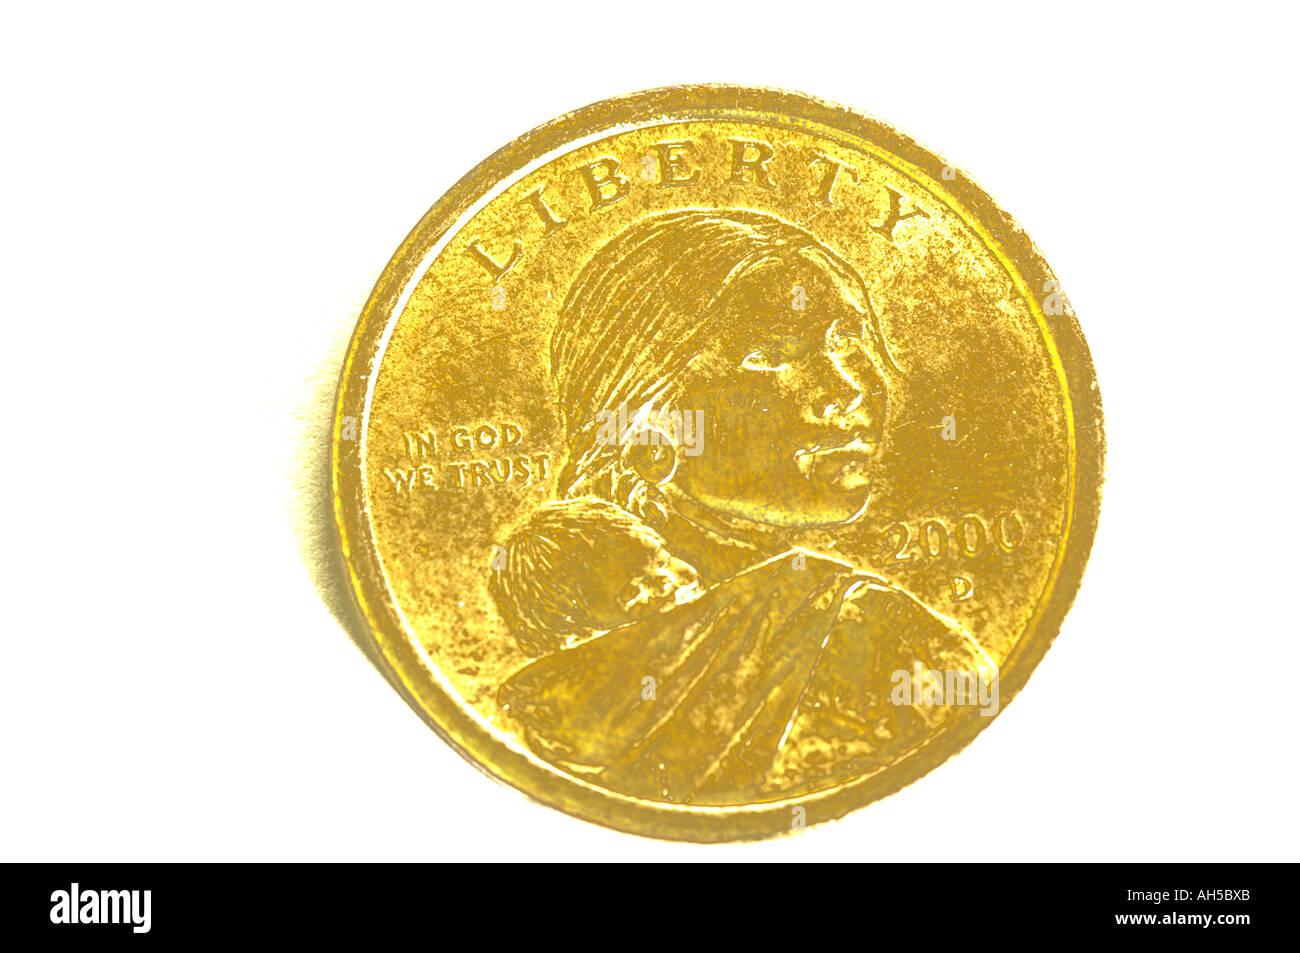 Sacajawea Gold 1 Dollar Münze Uns Stockfoto Bild 8207850 Alamy